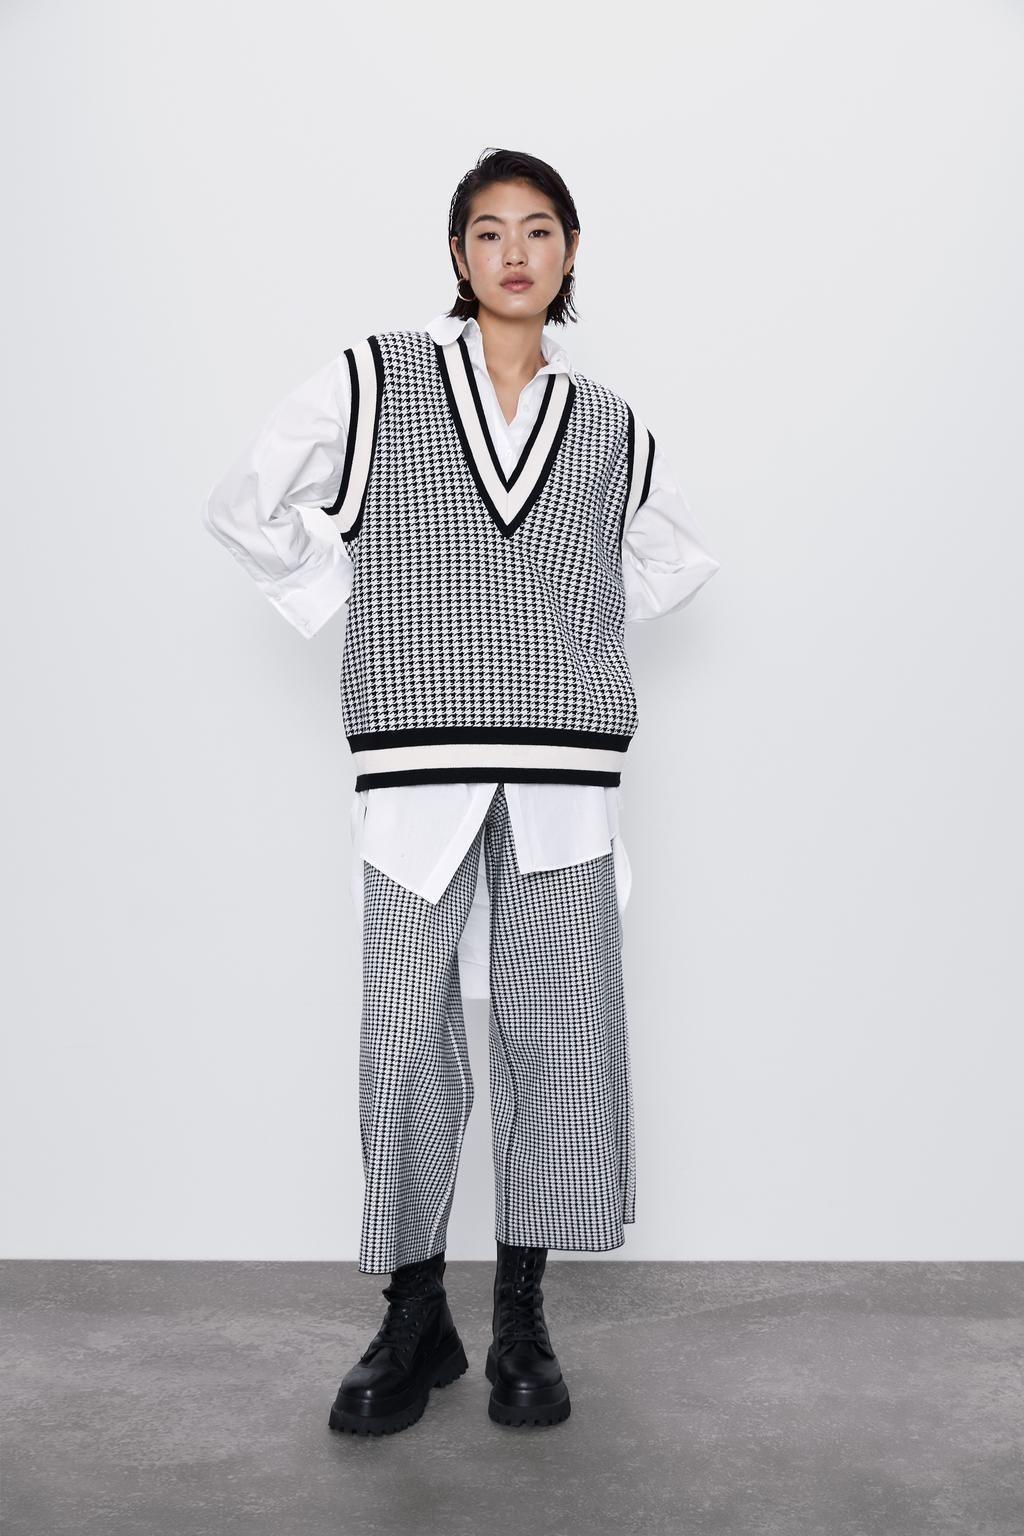 H5fYZ 19 Vest e inverno moda xadrez pássaro v-neck soltas de malha pullover Outono colete pullover para as mulheres 6873/135 6873135